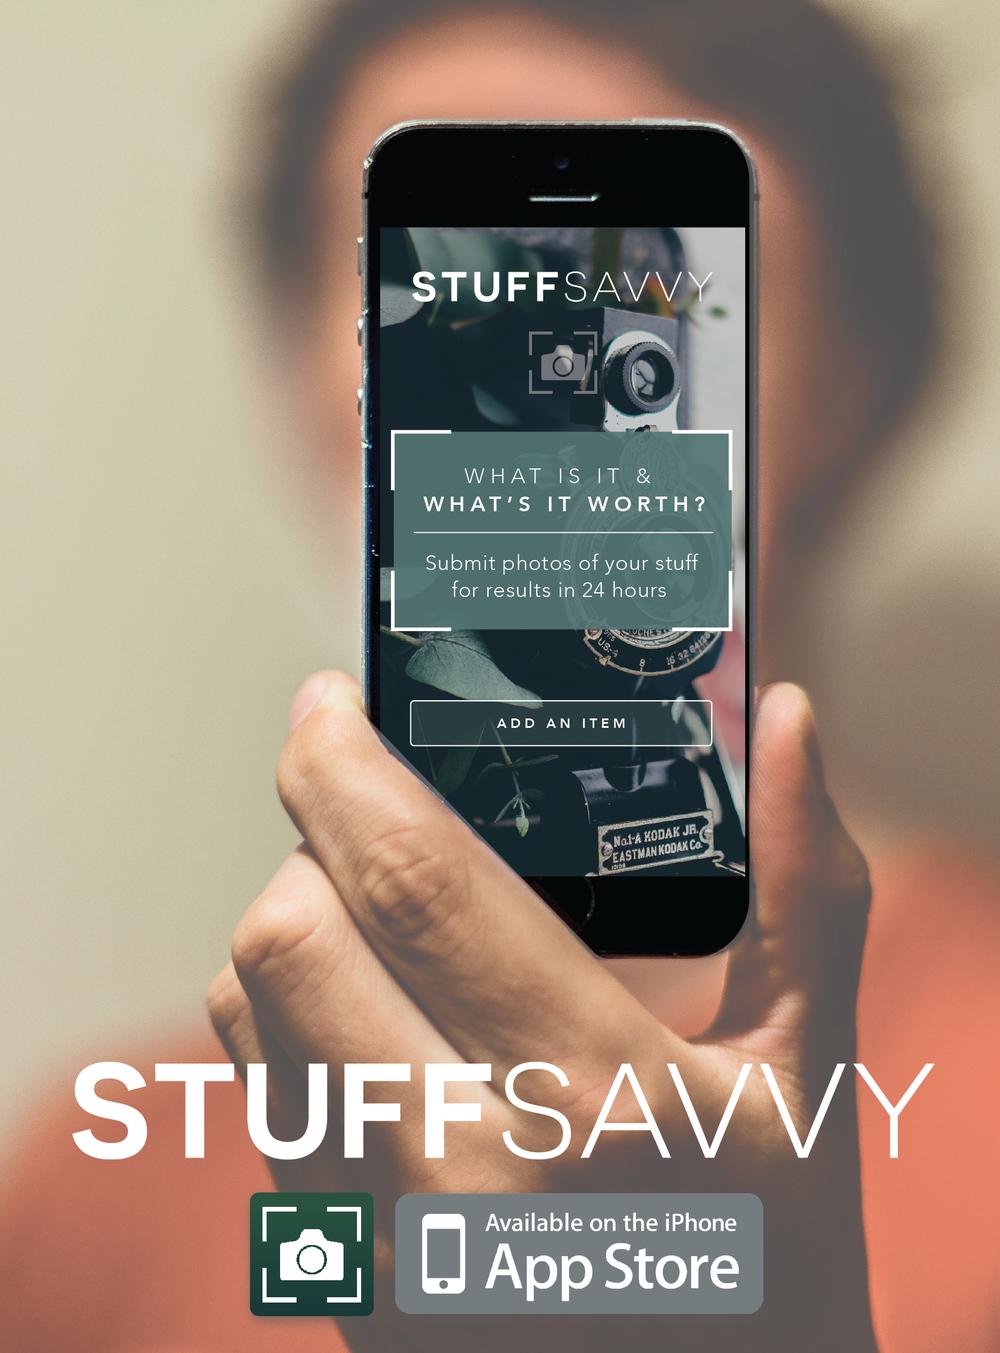 StuffSavvy-iphone-app